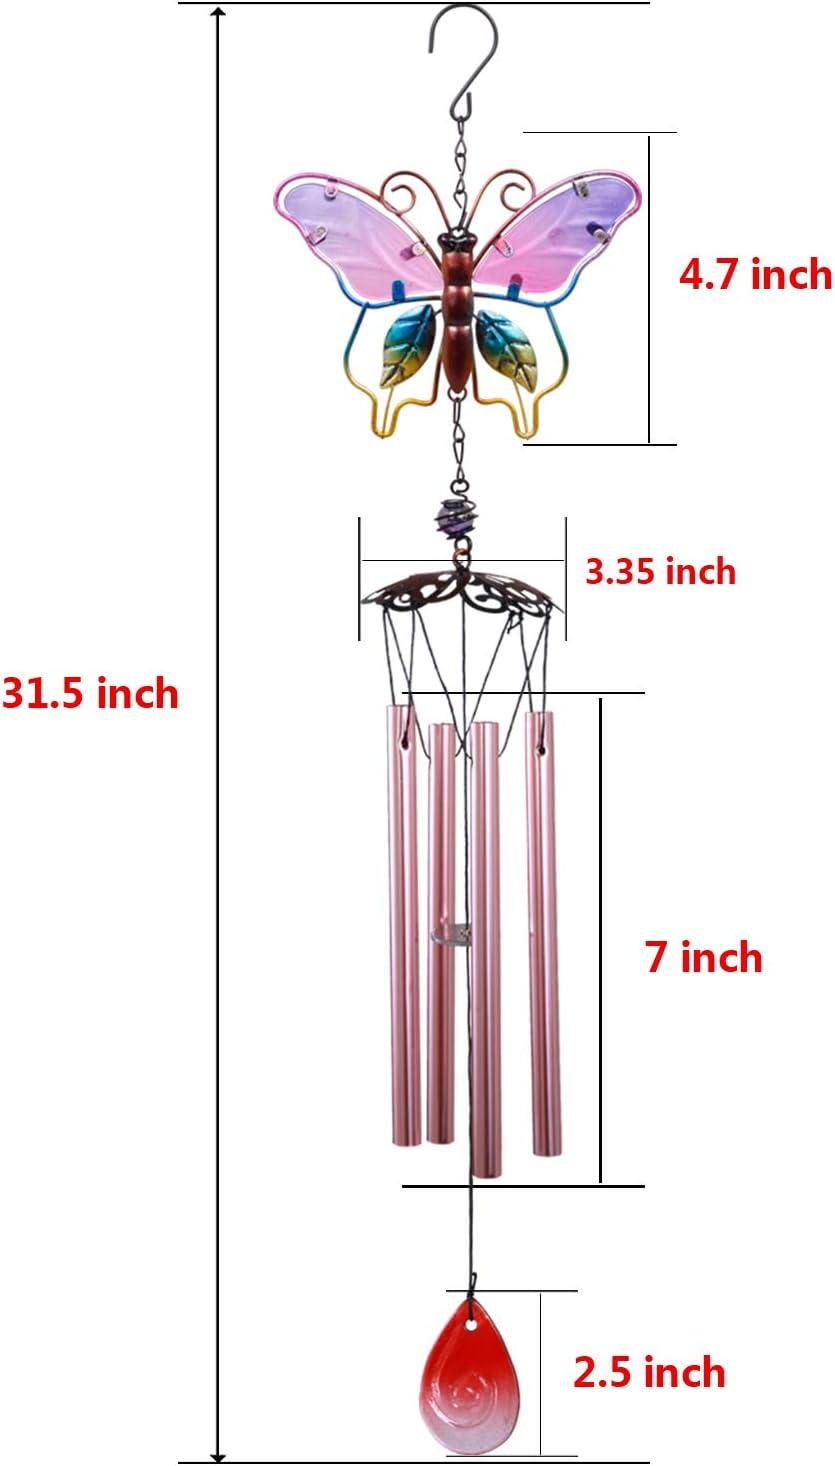 Sweet Do 2 Pcs Wind Chime Metal Wind Spinner Butterfly Wind Bell for Patio Lawn Garden Decor